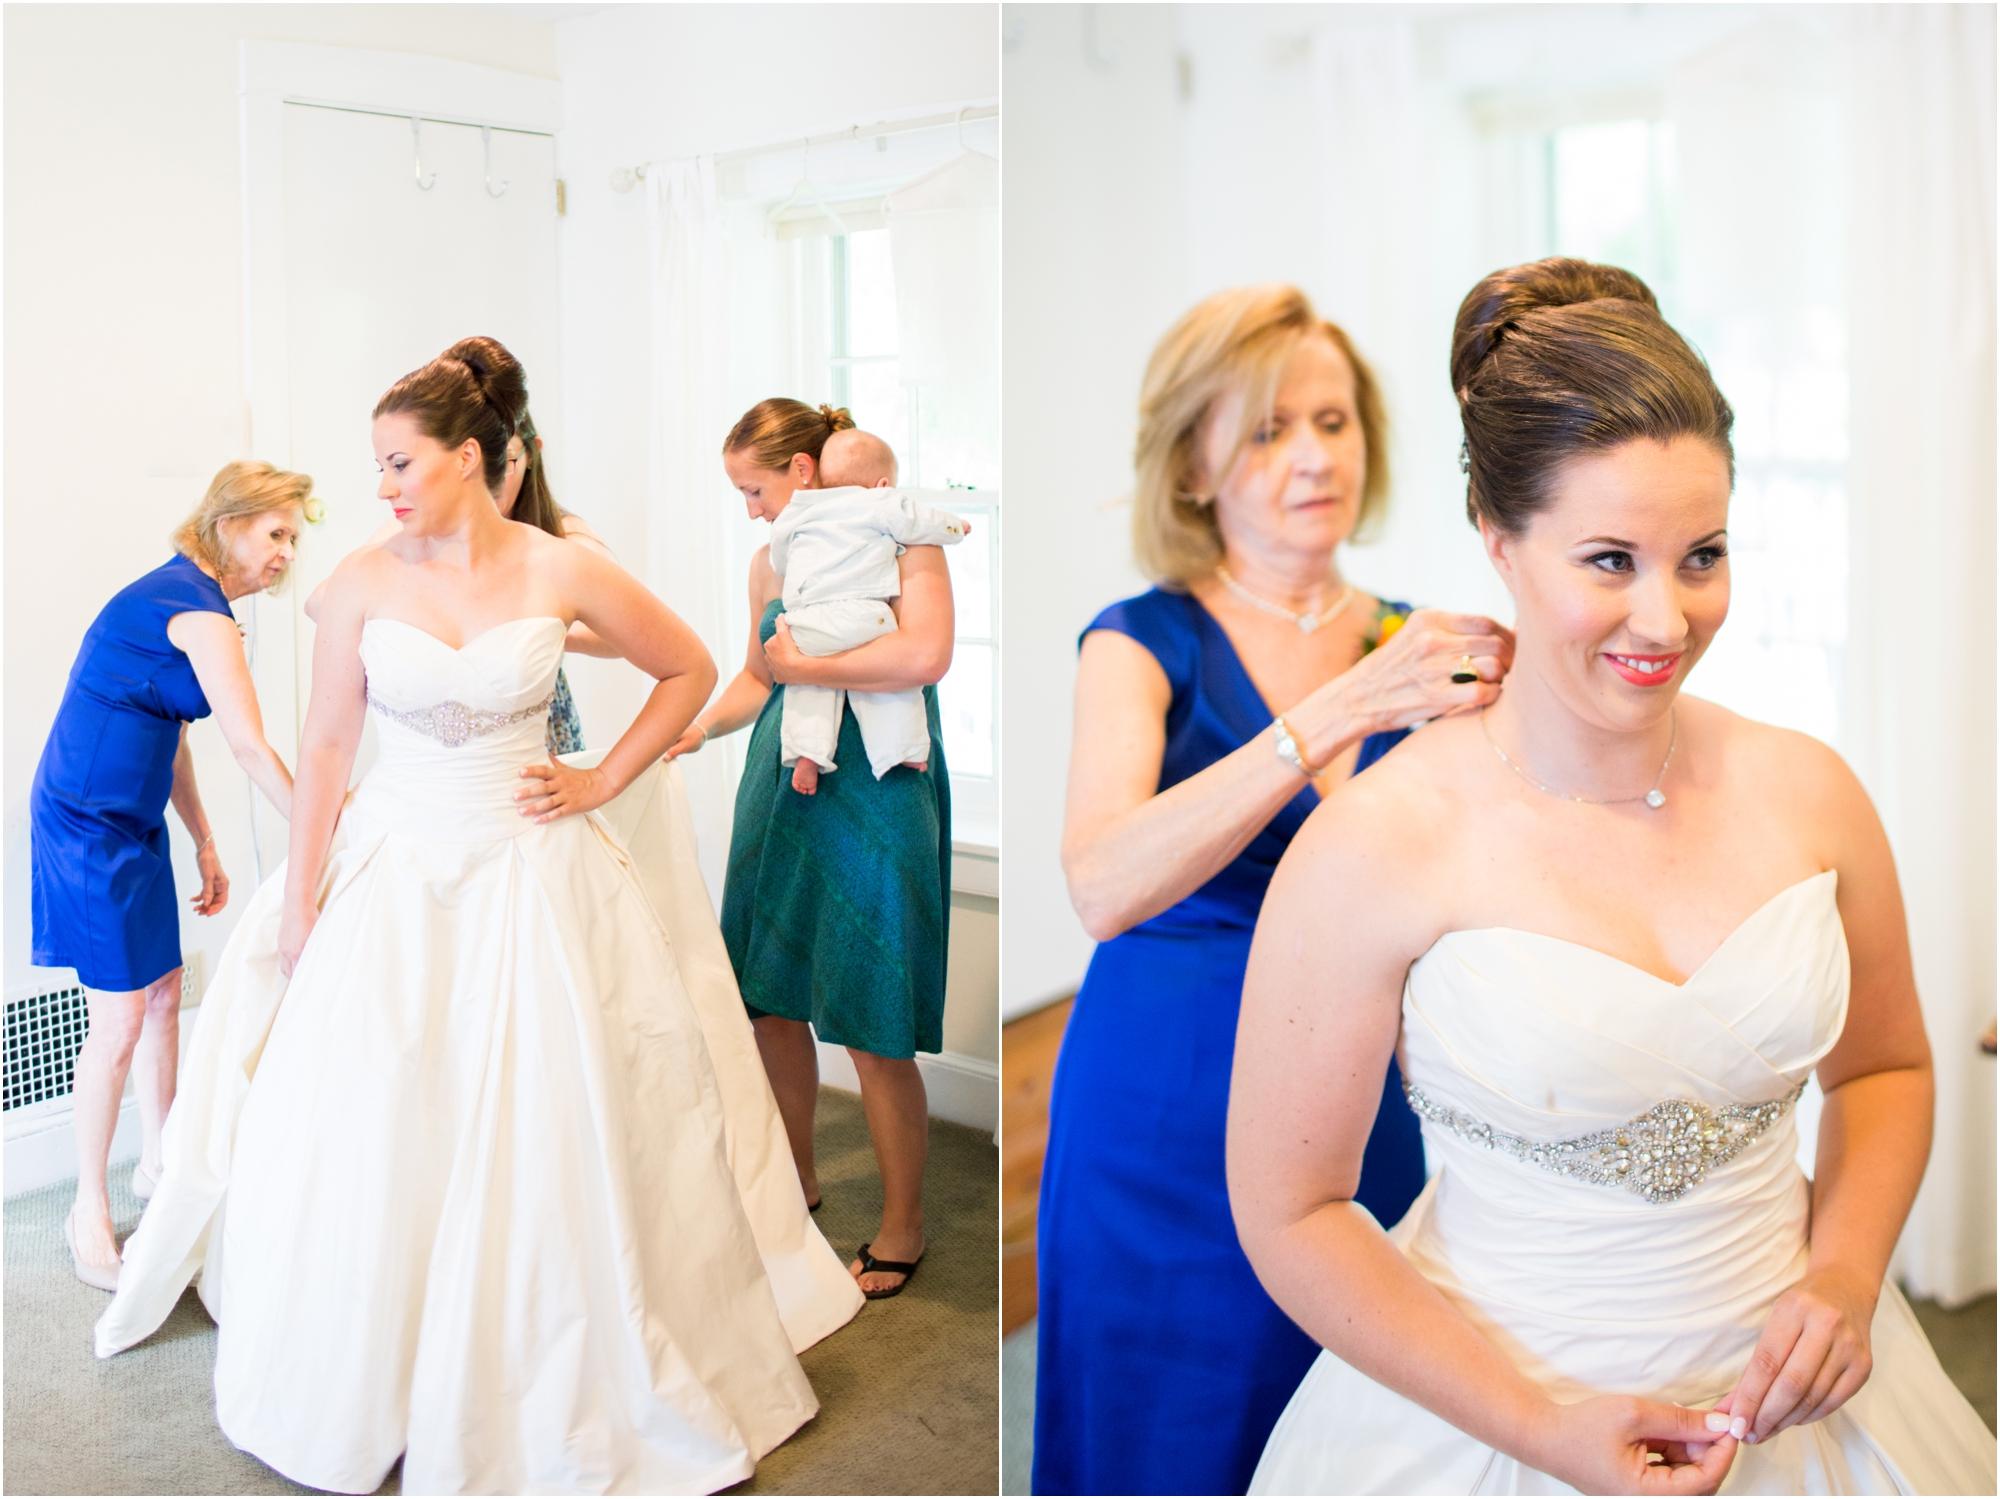 2-Berkstresser Wedding Getting Ready-229_anna grace photography pennsylvania wedding photographer riverdale manor.jpg